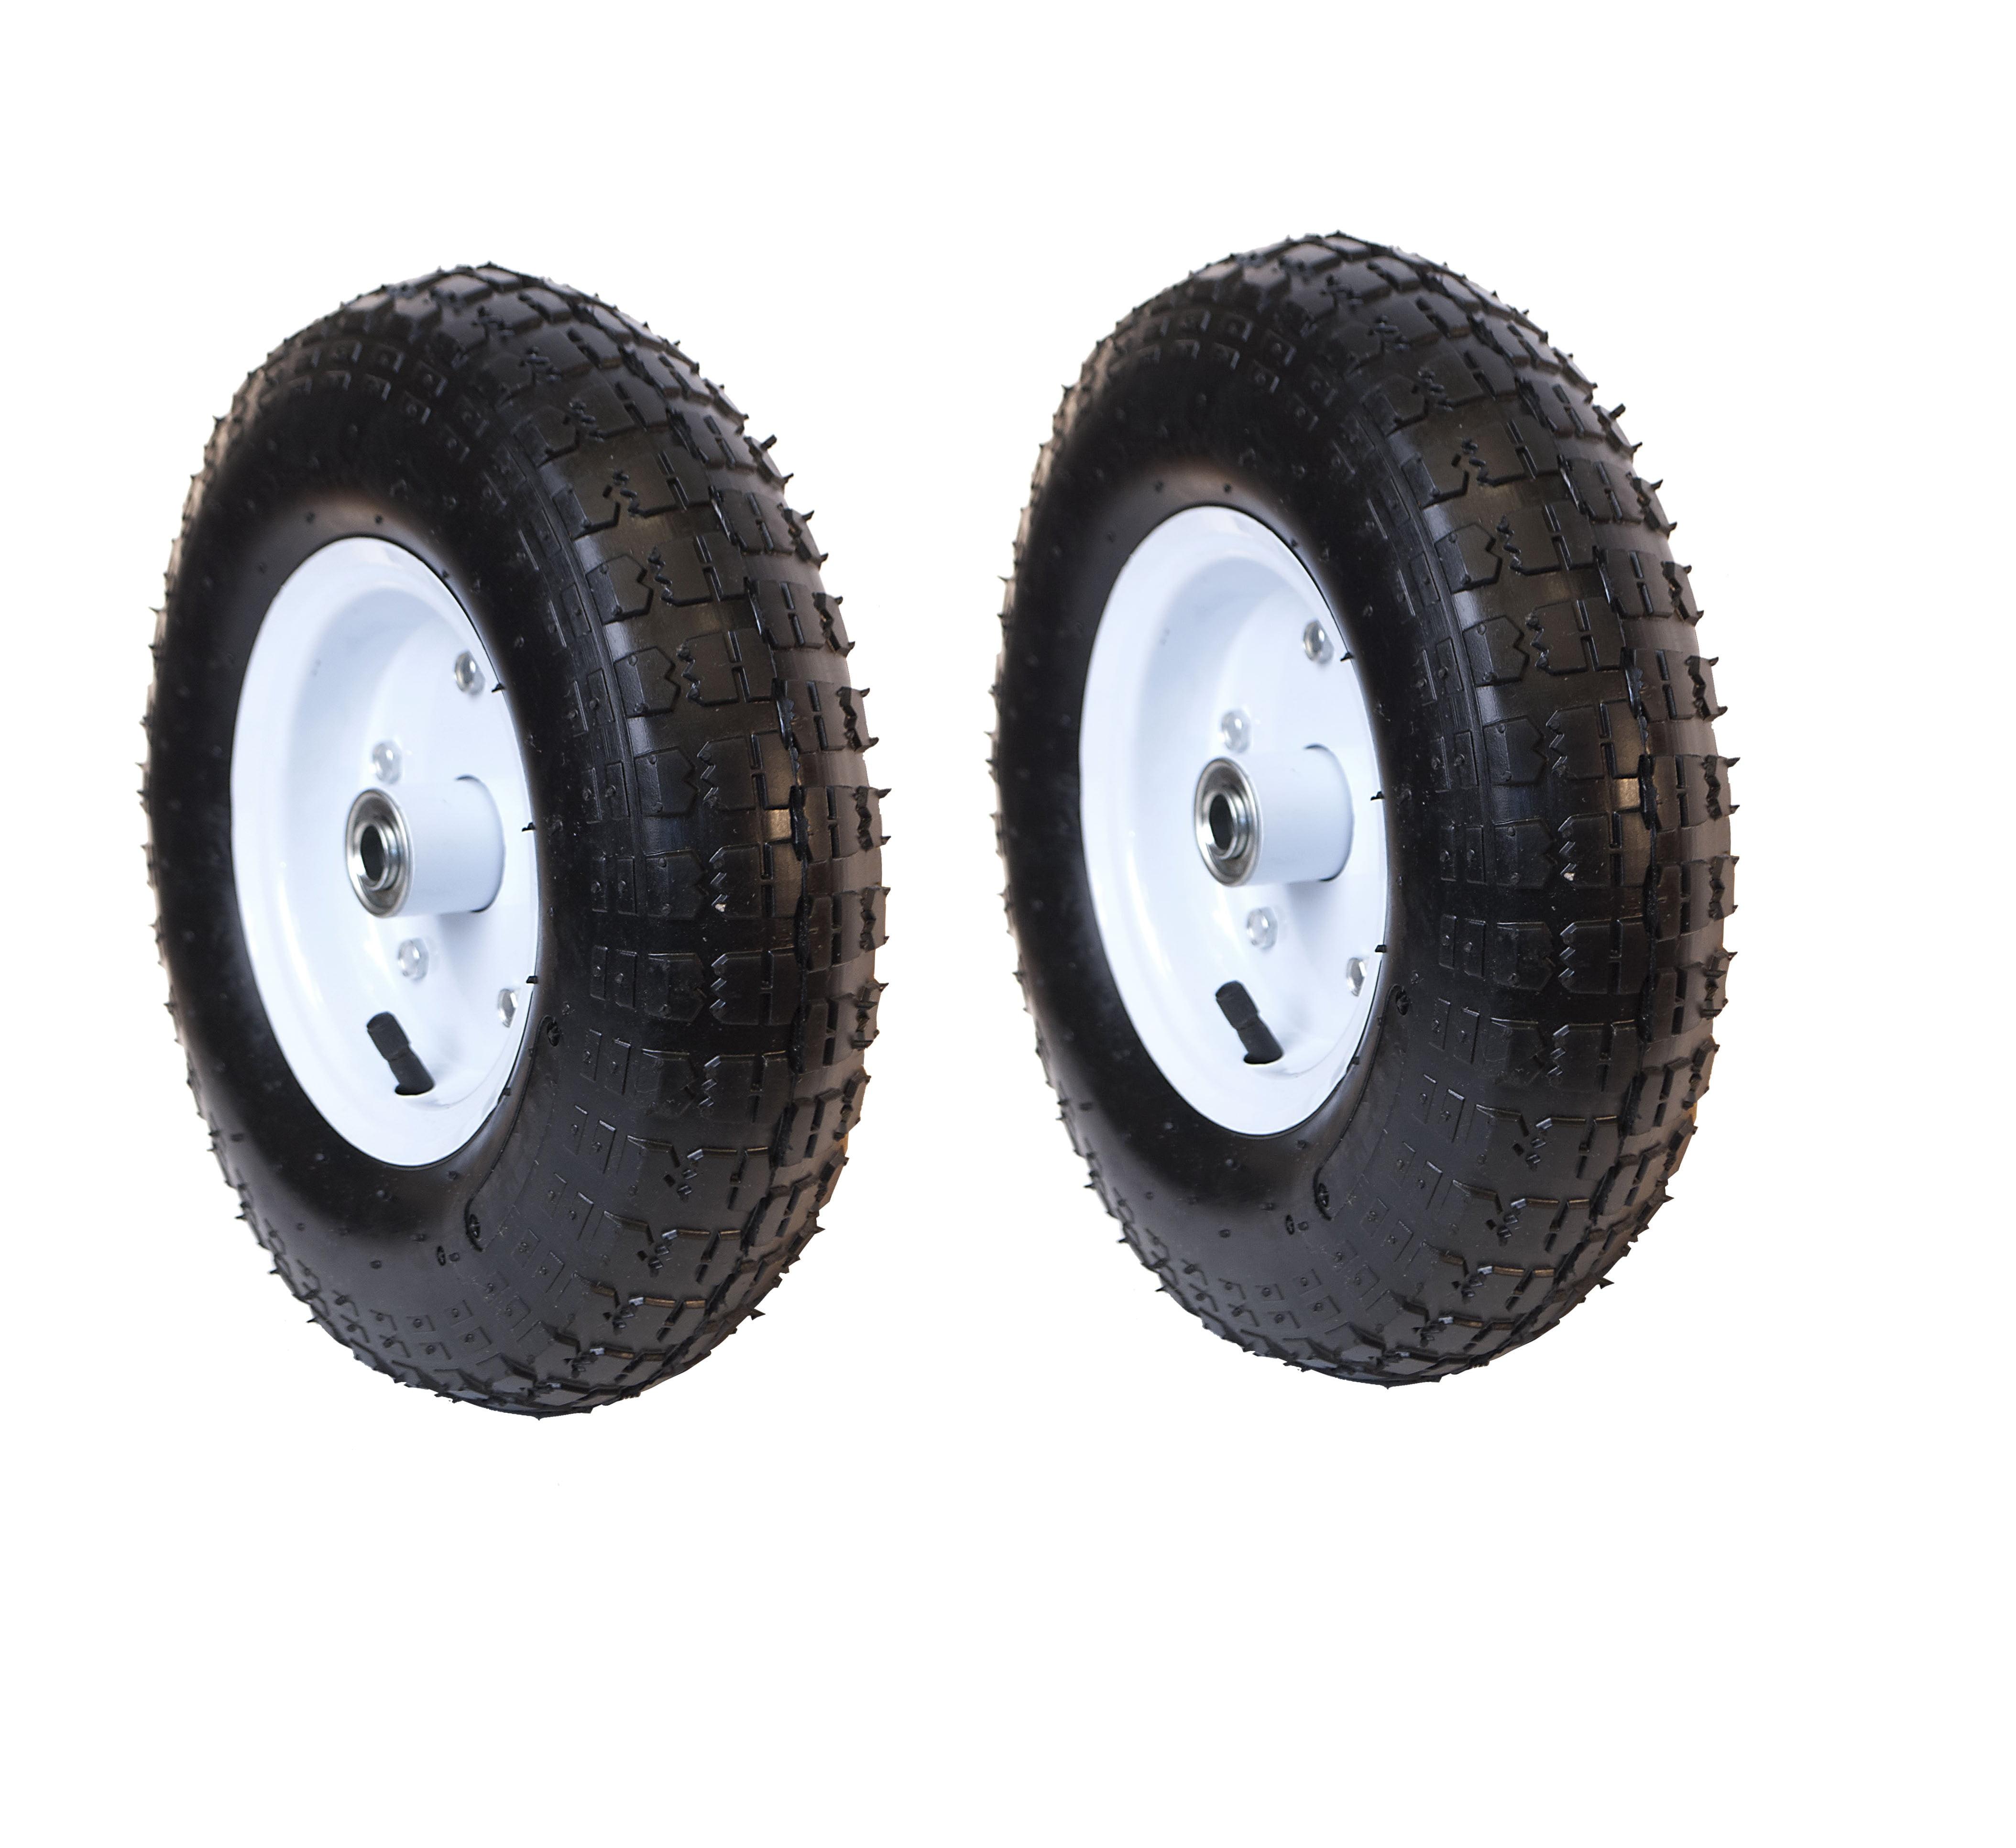 ALEKO Turf Pneumatic Replacement Wheel for Wheelbarrow - 13 Inch - Black Tire with White Rim - Set of 2